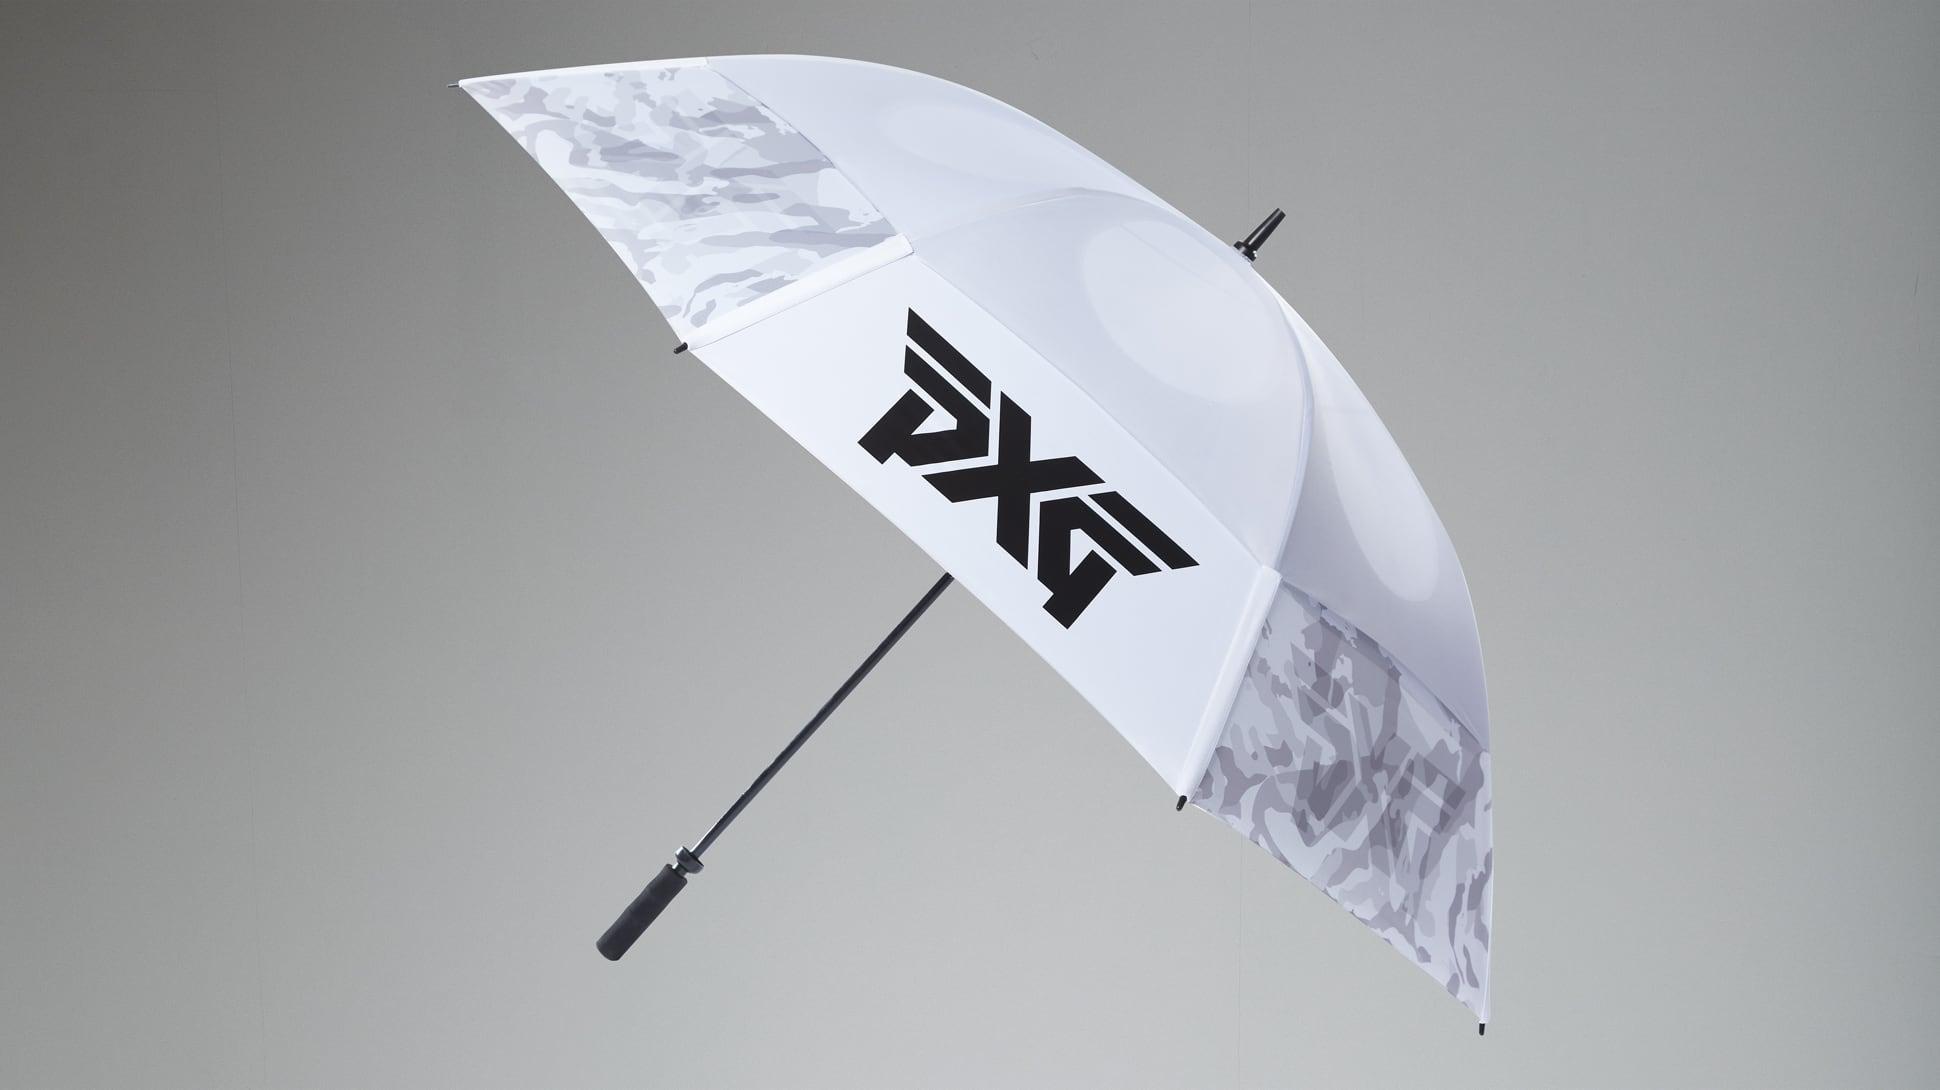 Dual Canopy Umbrella Image 1